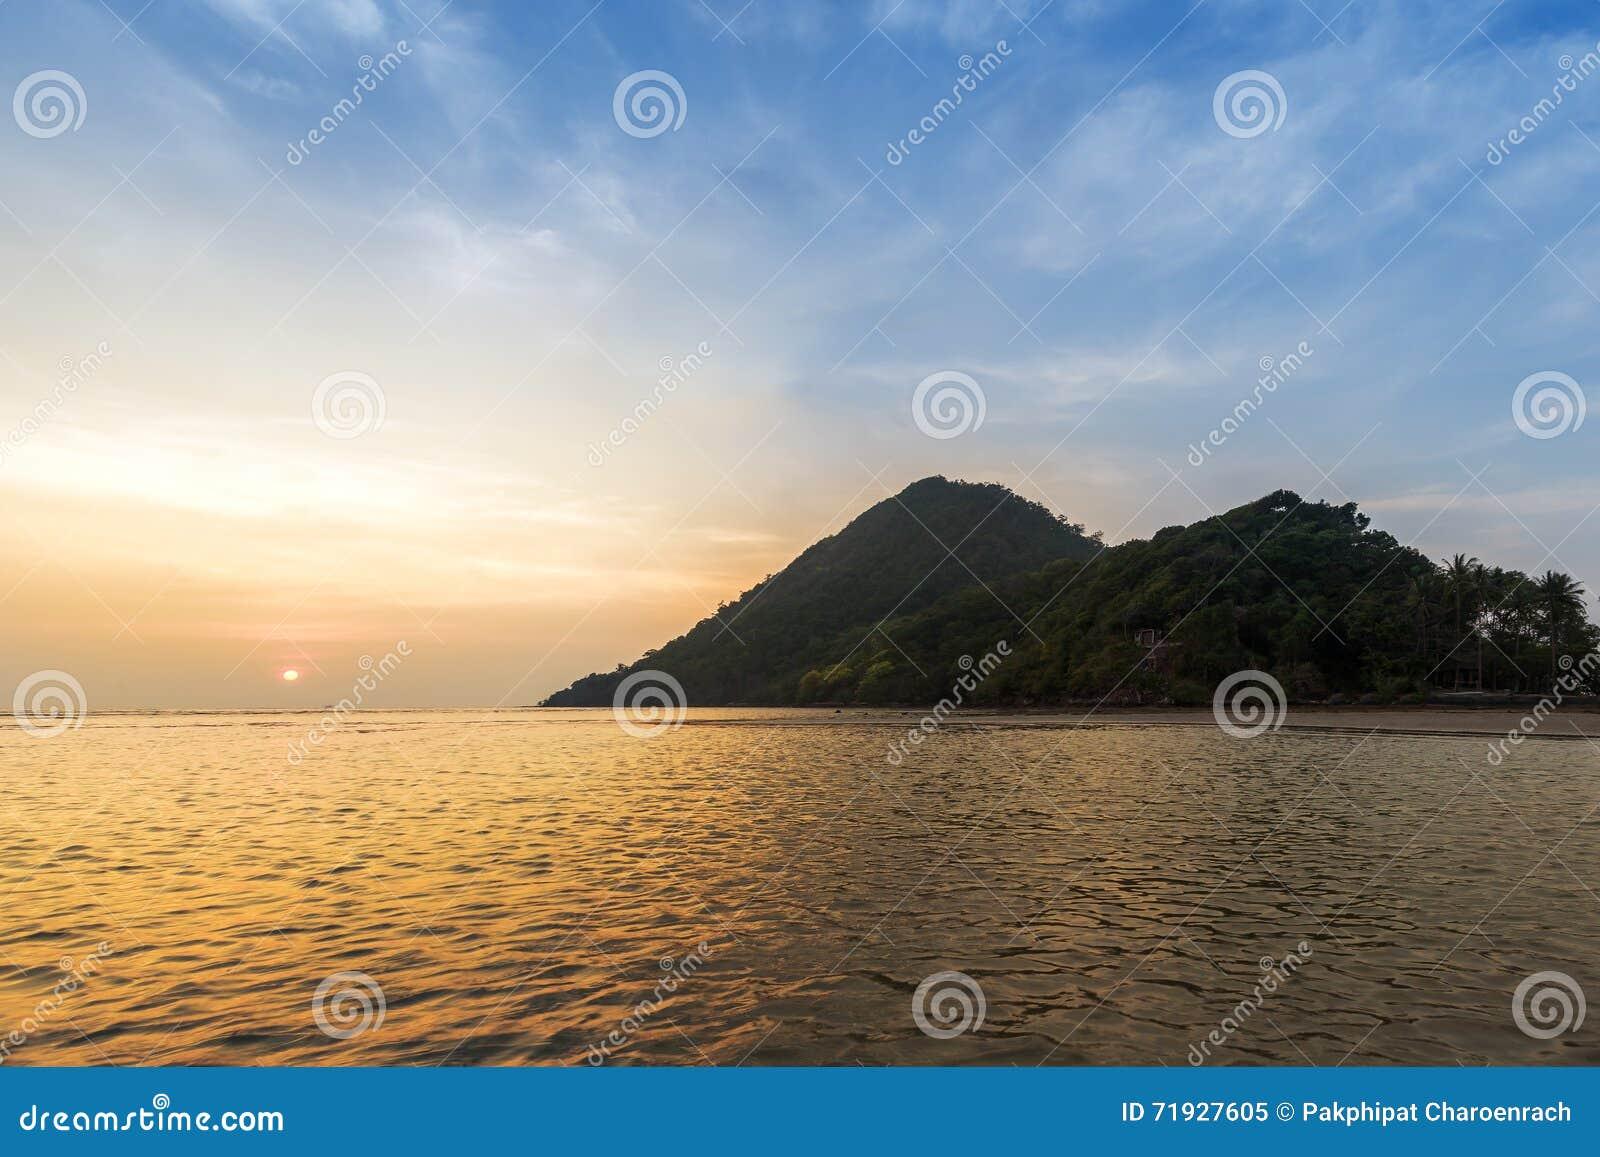 Красивое небо захода солнца над горой, морем и пляжем